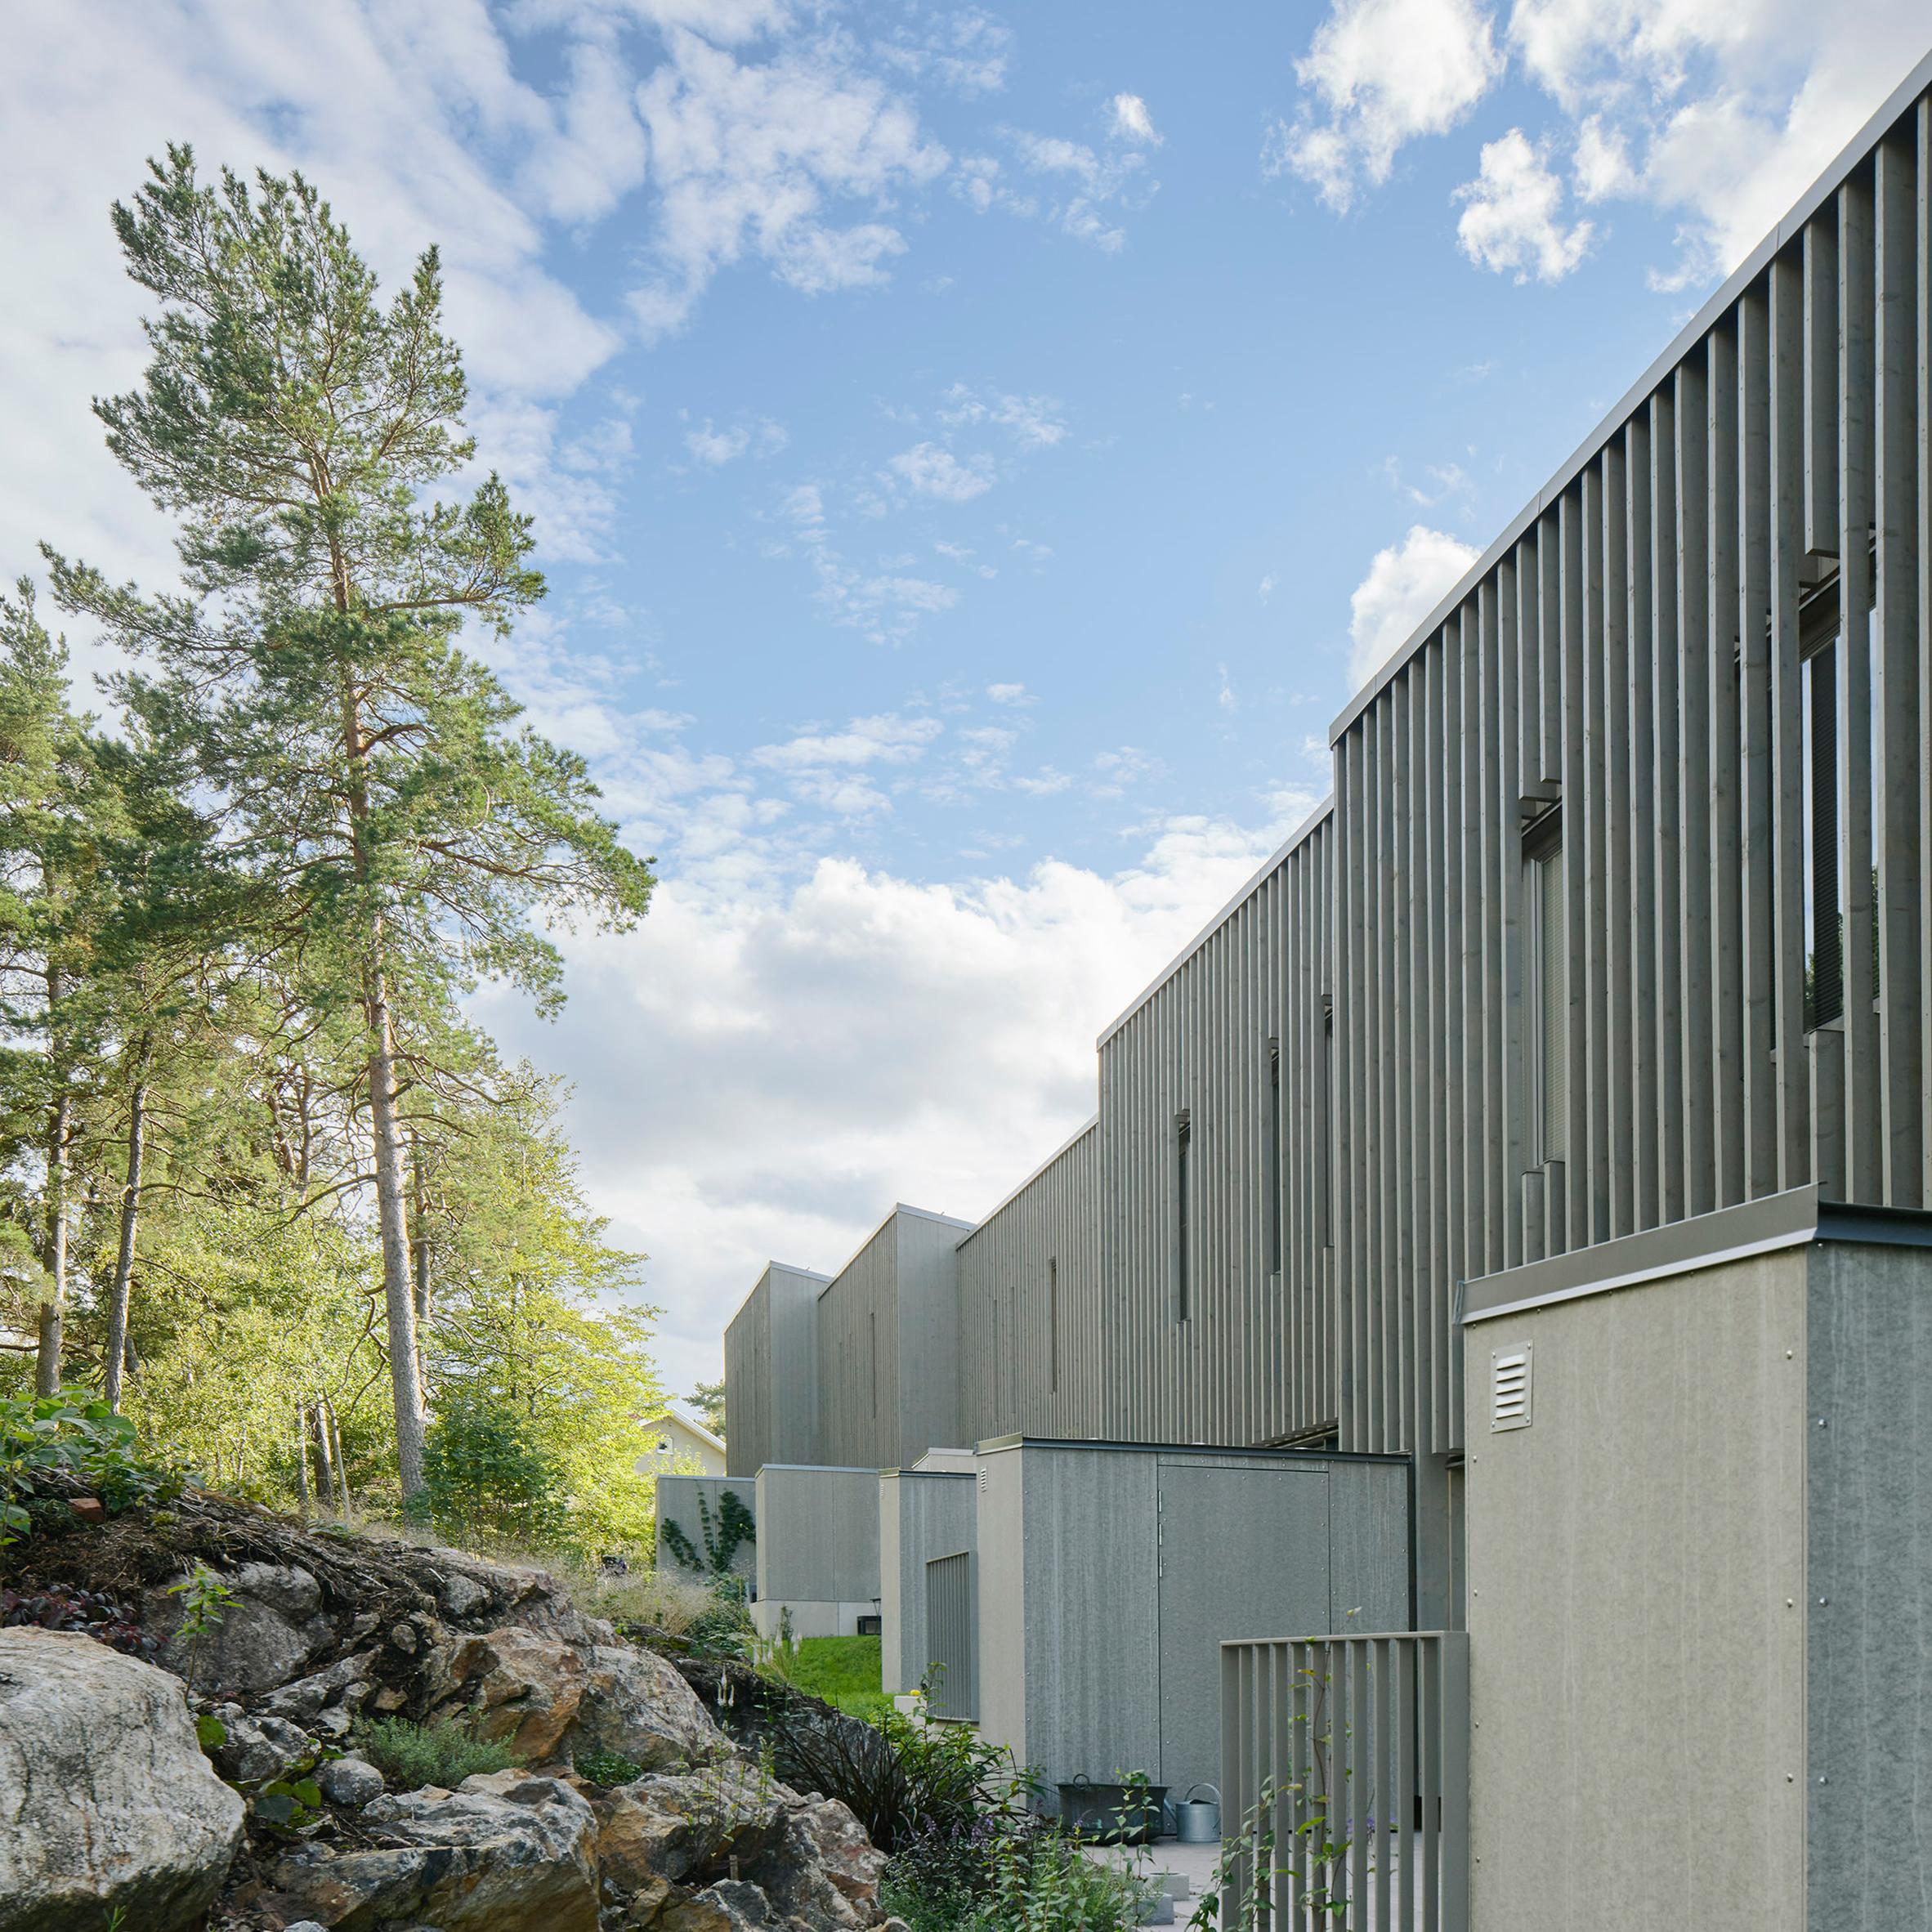 house design and architecture in sweden dezeen